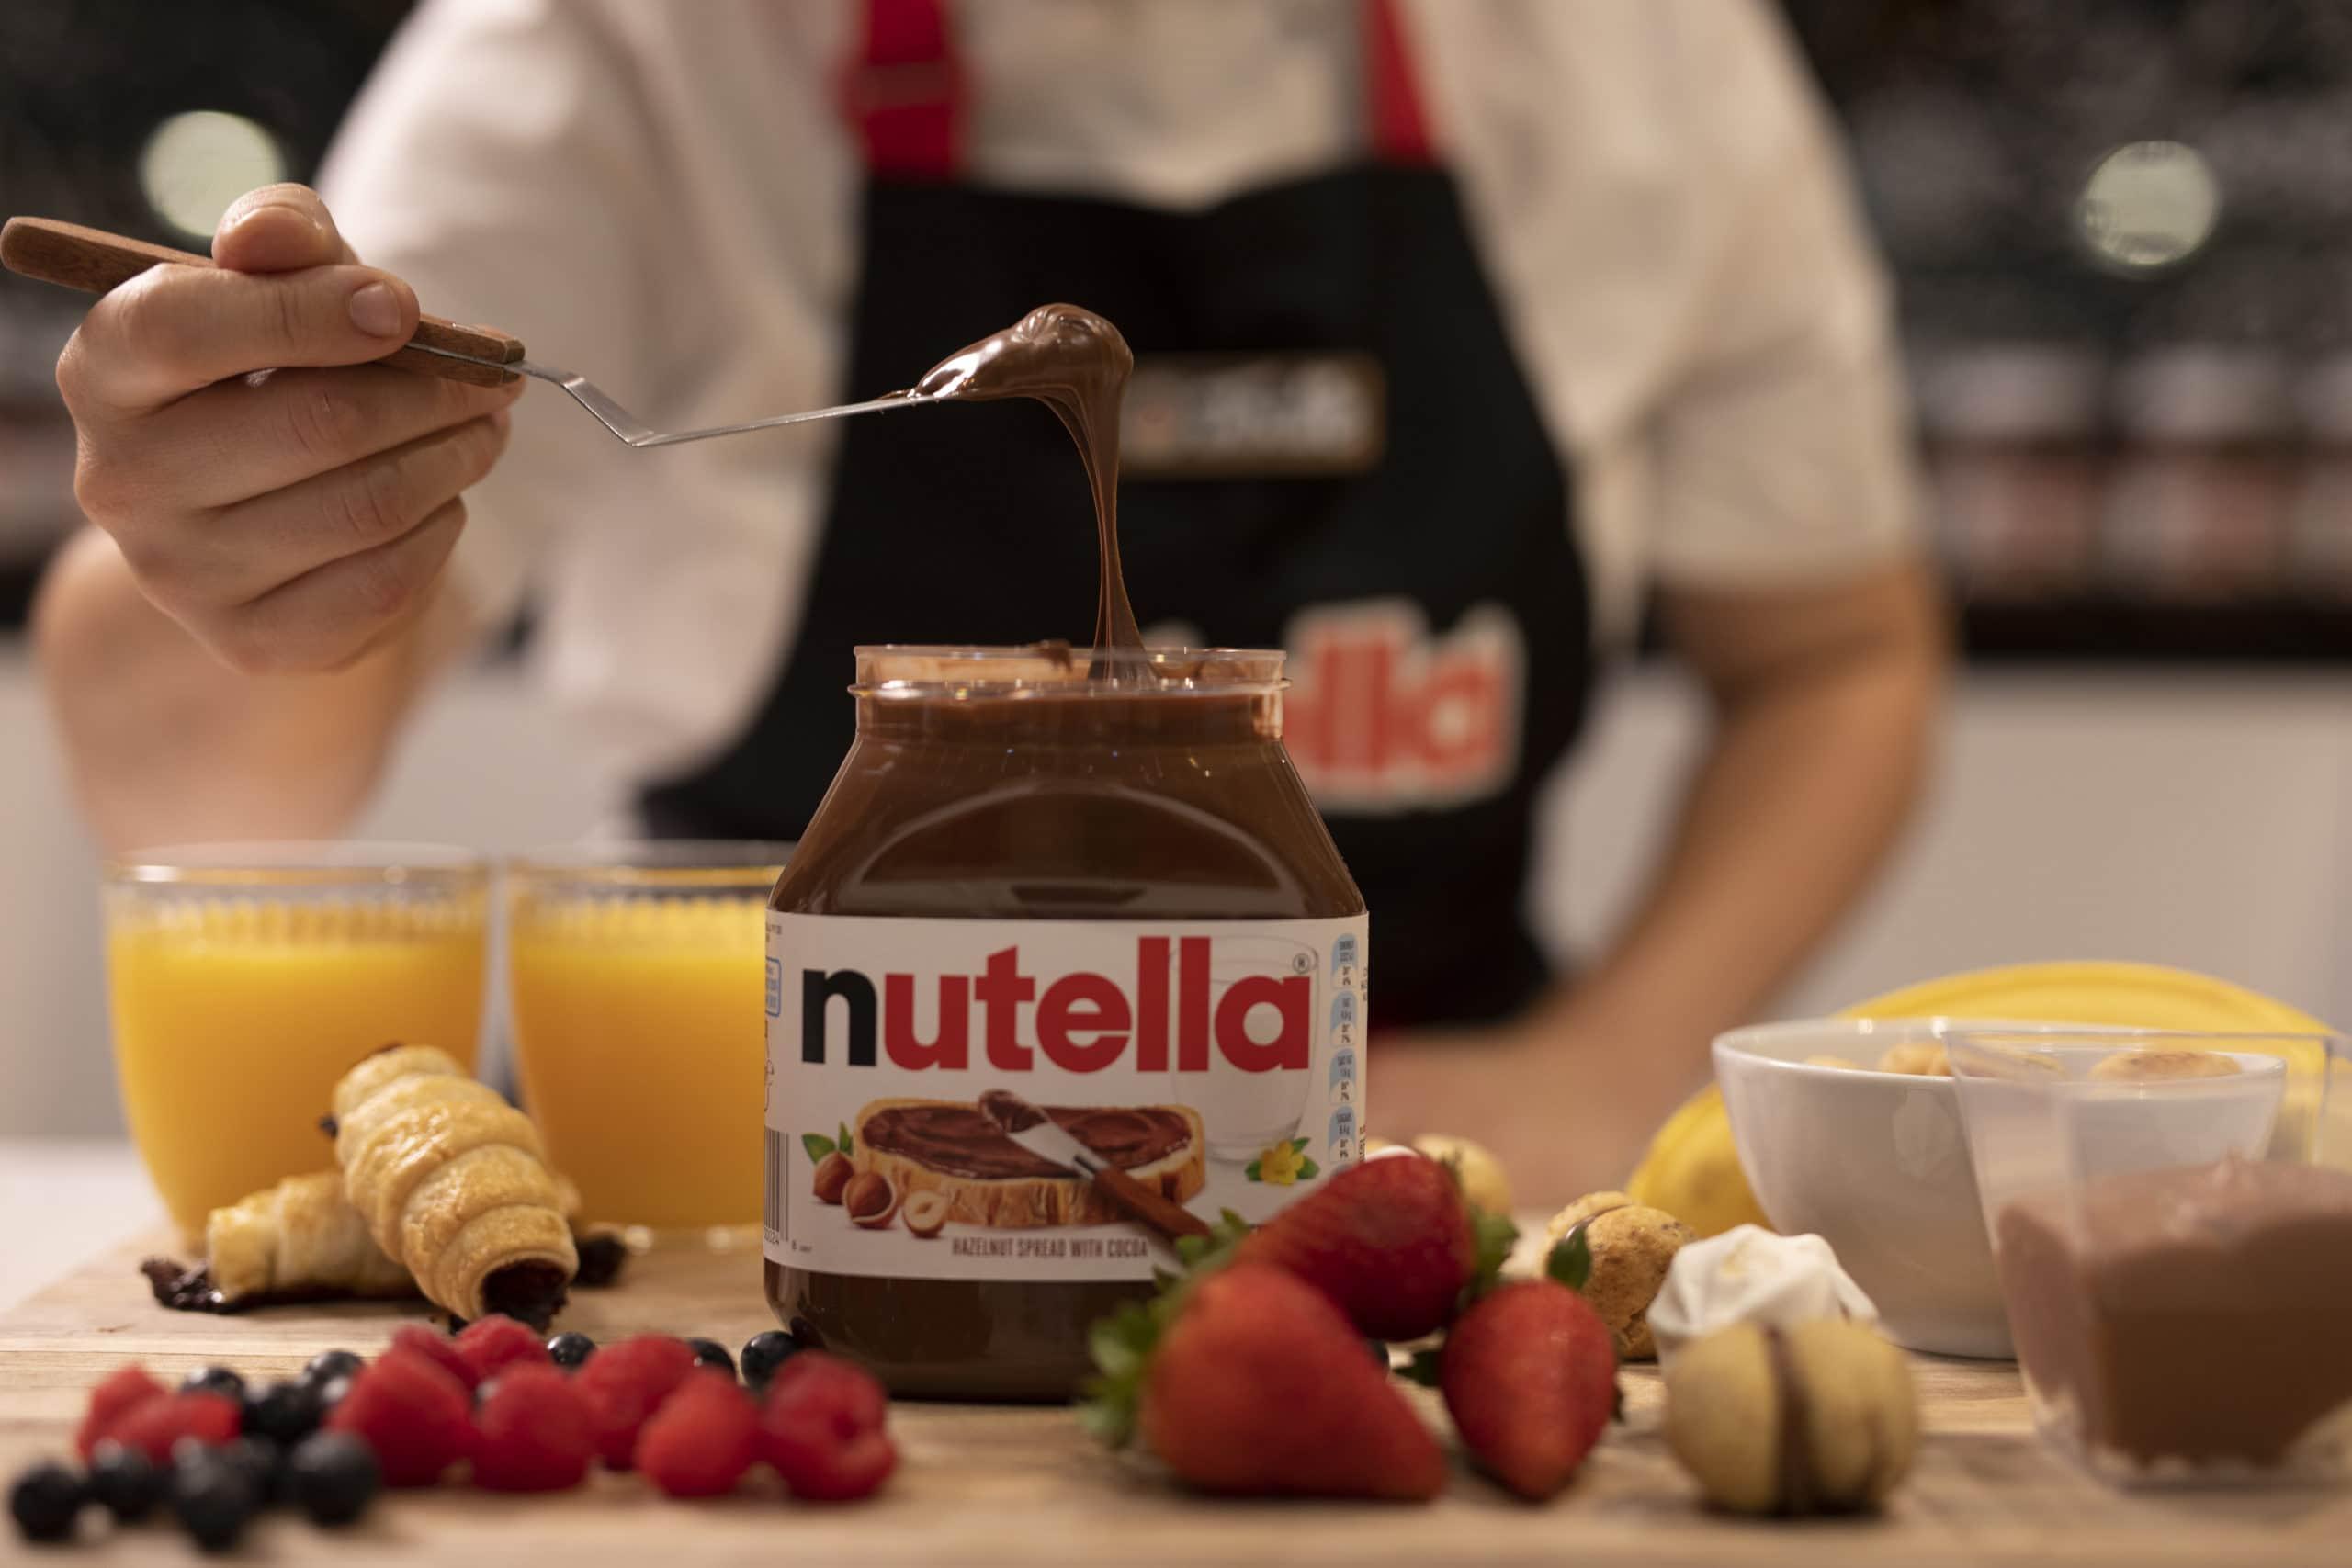 Nutella 12052021 HR 16